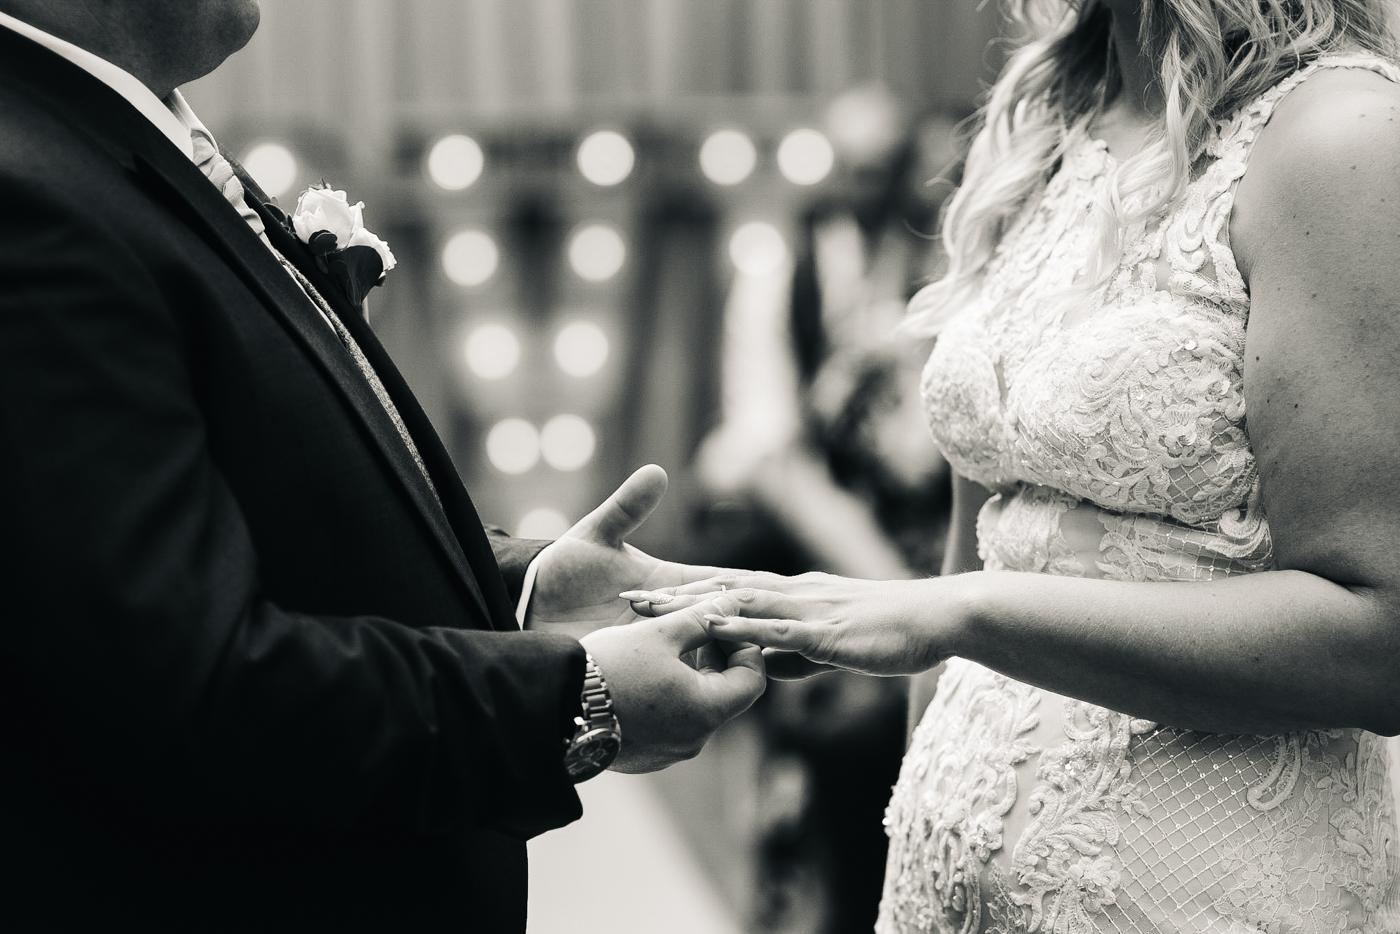 headlame-hall-north-yorkshire-north-east-photographer-wedding-0021.jpg